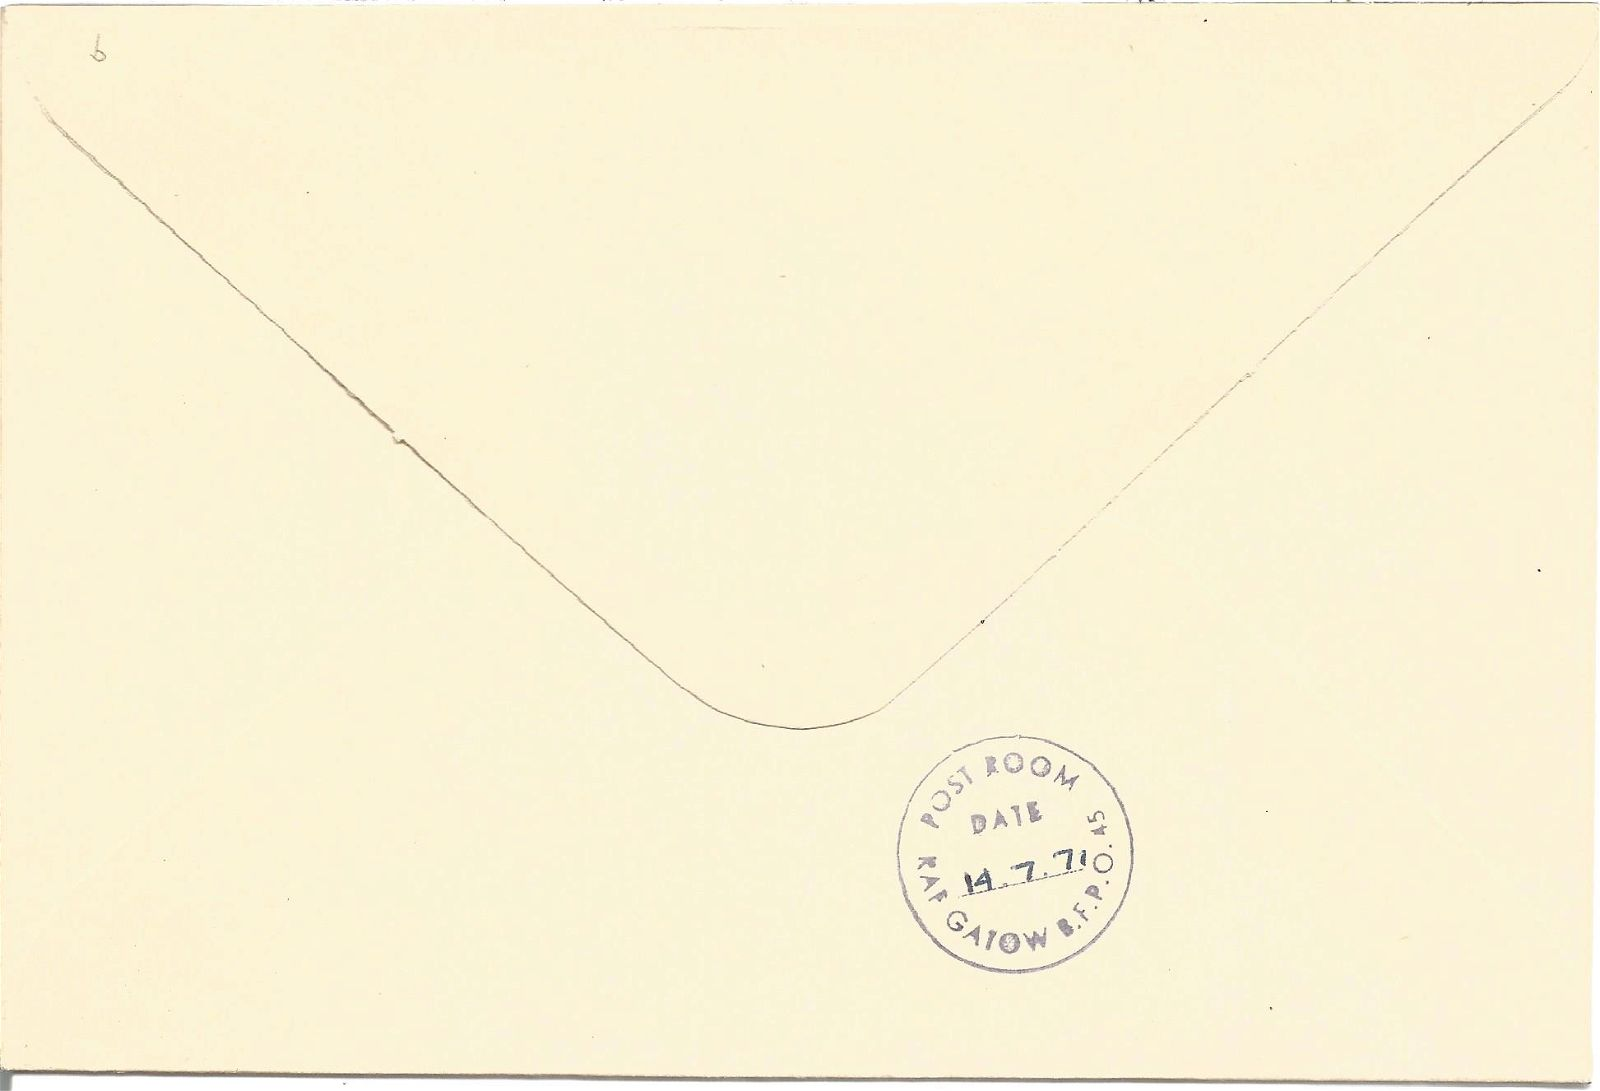 Sqn. Ldr. R. E. Lockhart signed RAF Leeming 30th